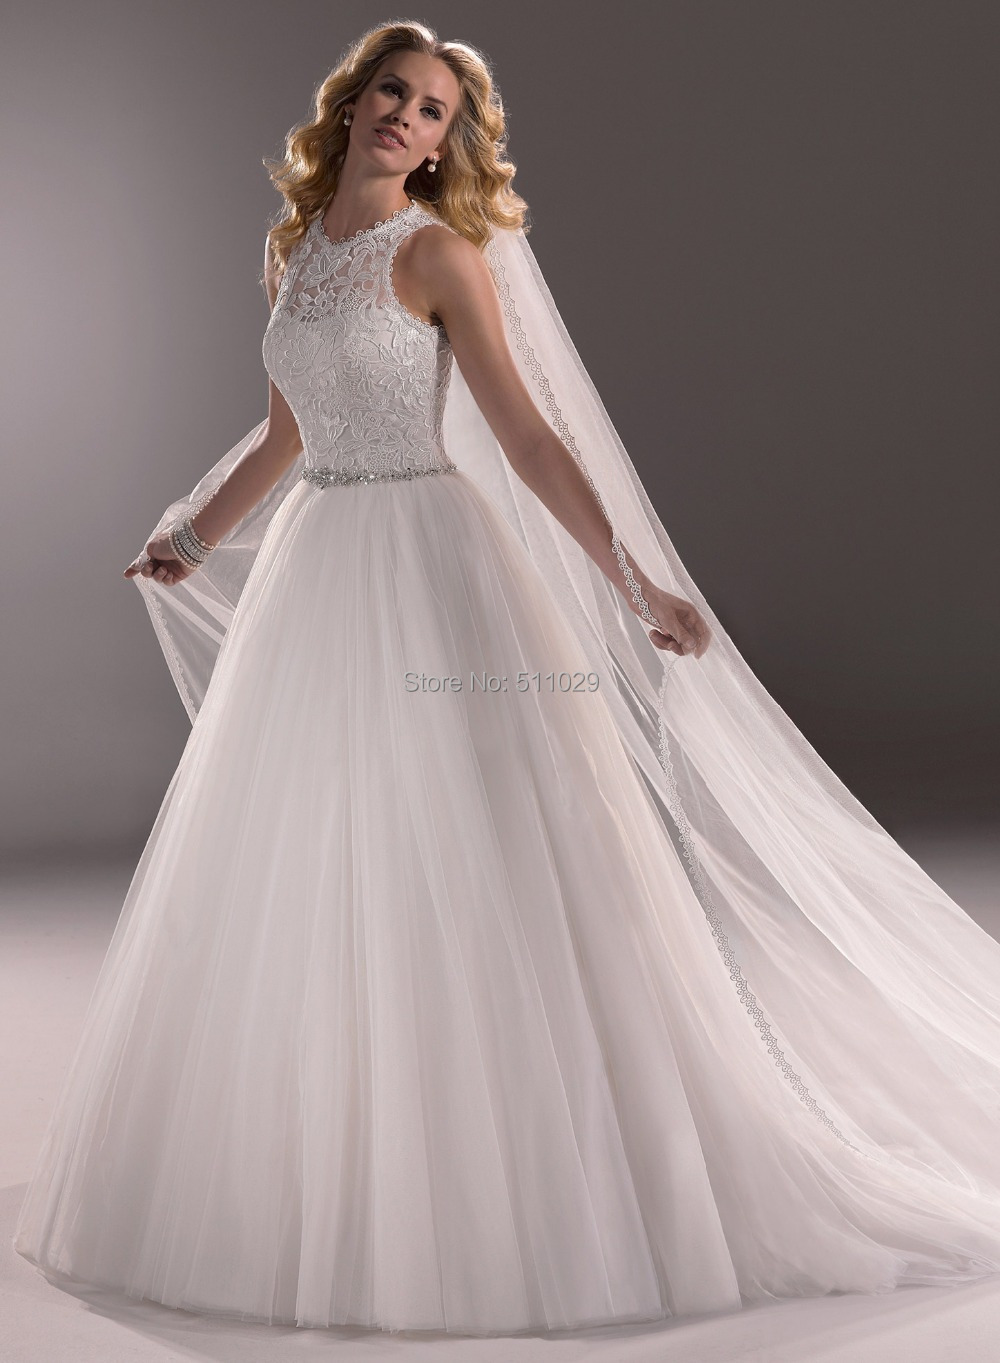 cinderella wedding dresses Cinderella s Wedding DressI had to draw Ella s wedding dress Designed by the amazing Sandy Powell